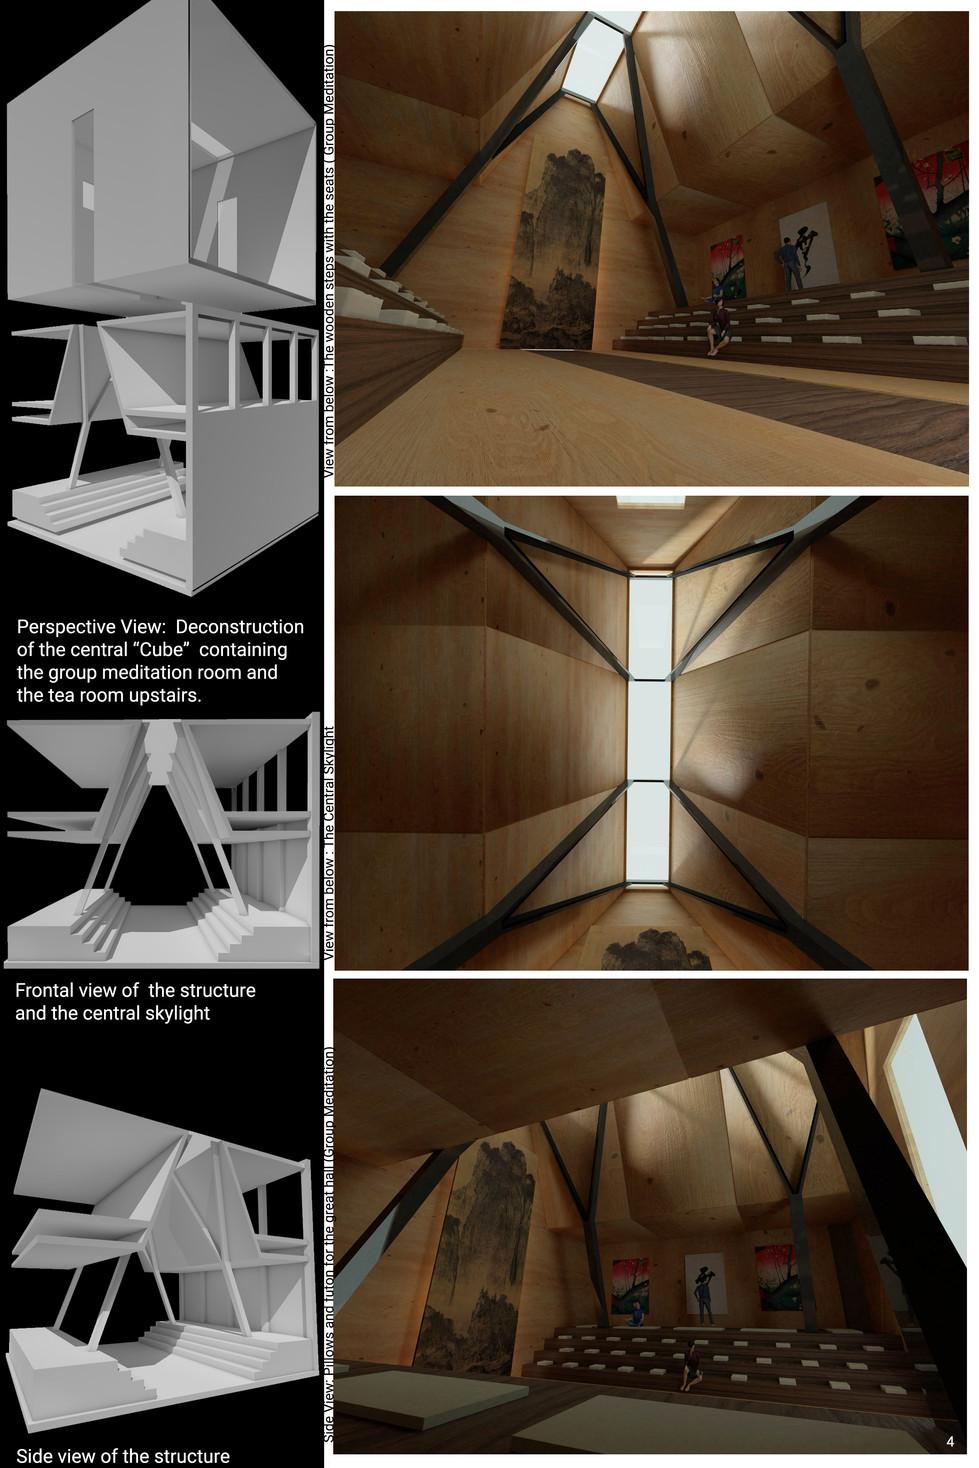 Structure / Group meditation room